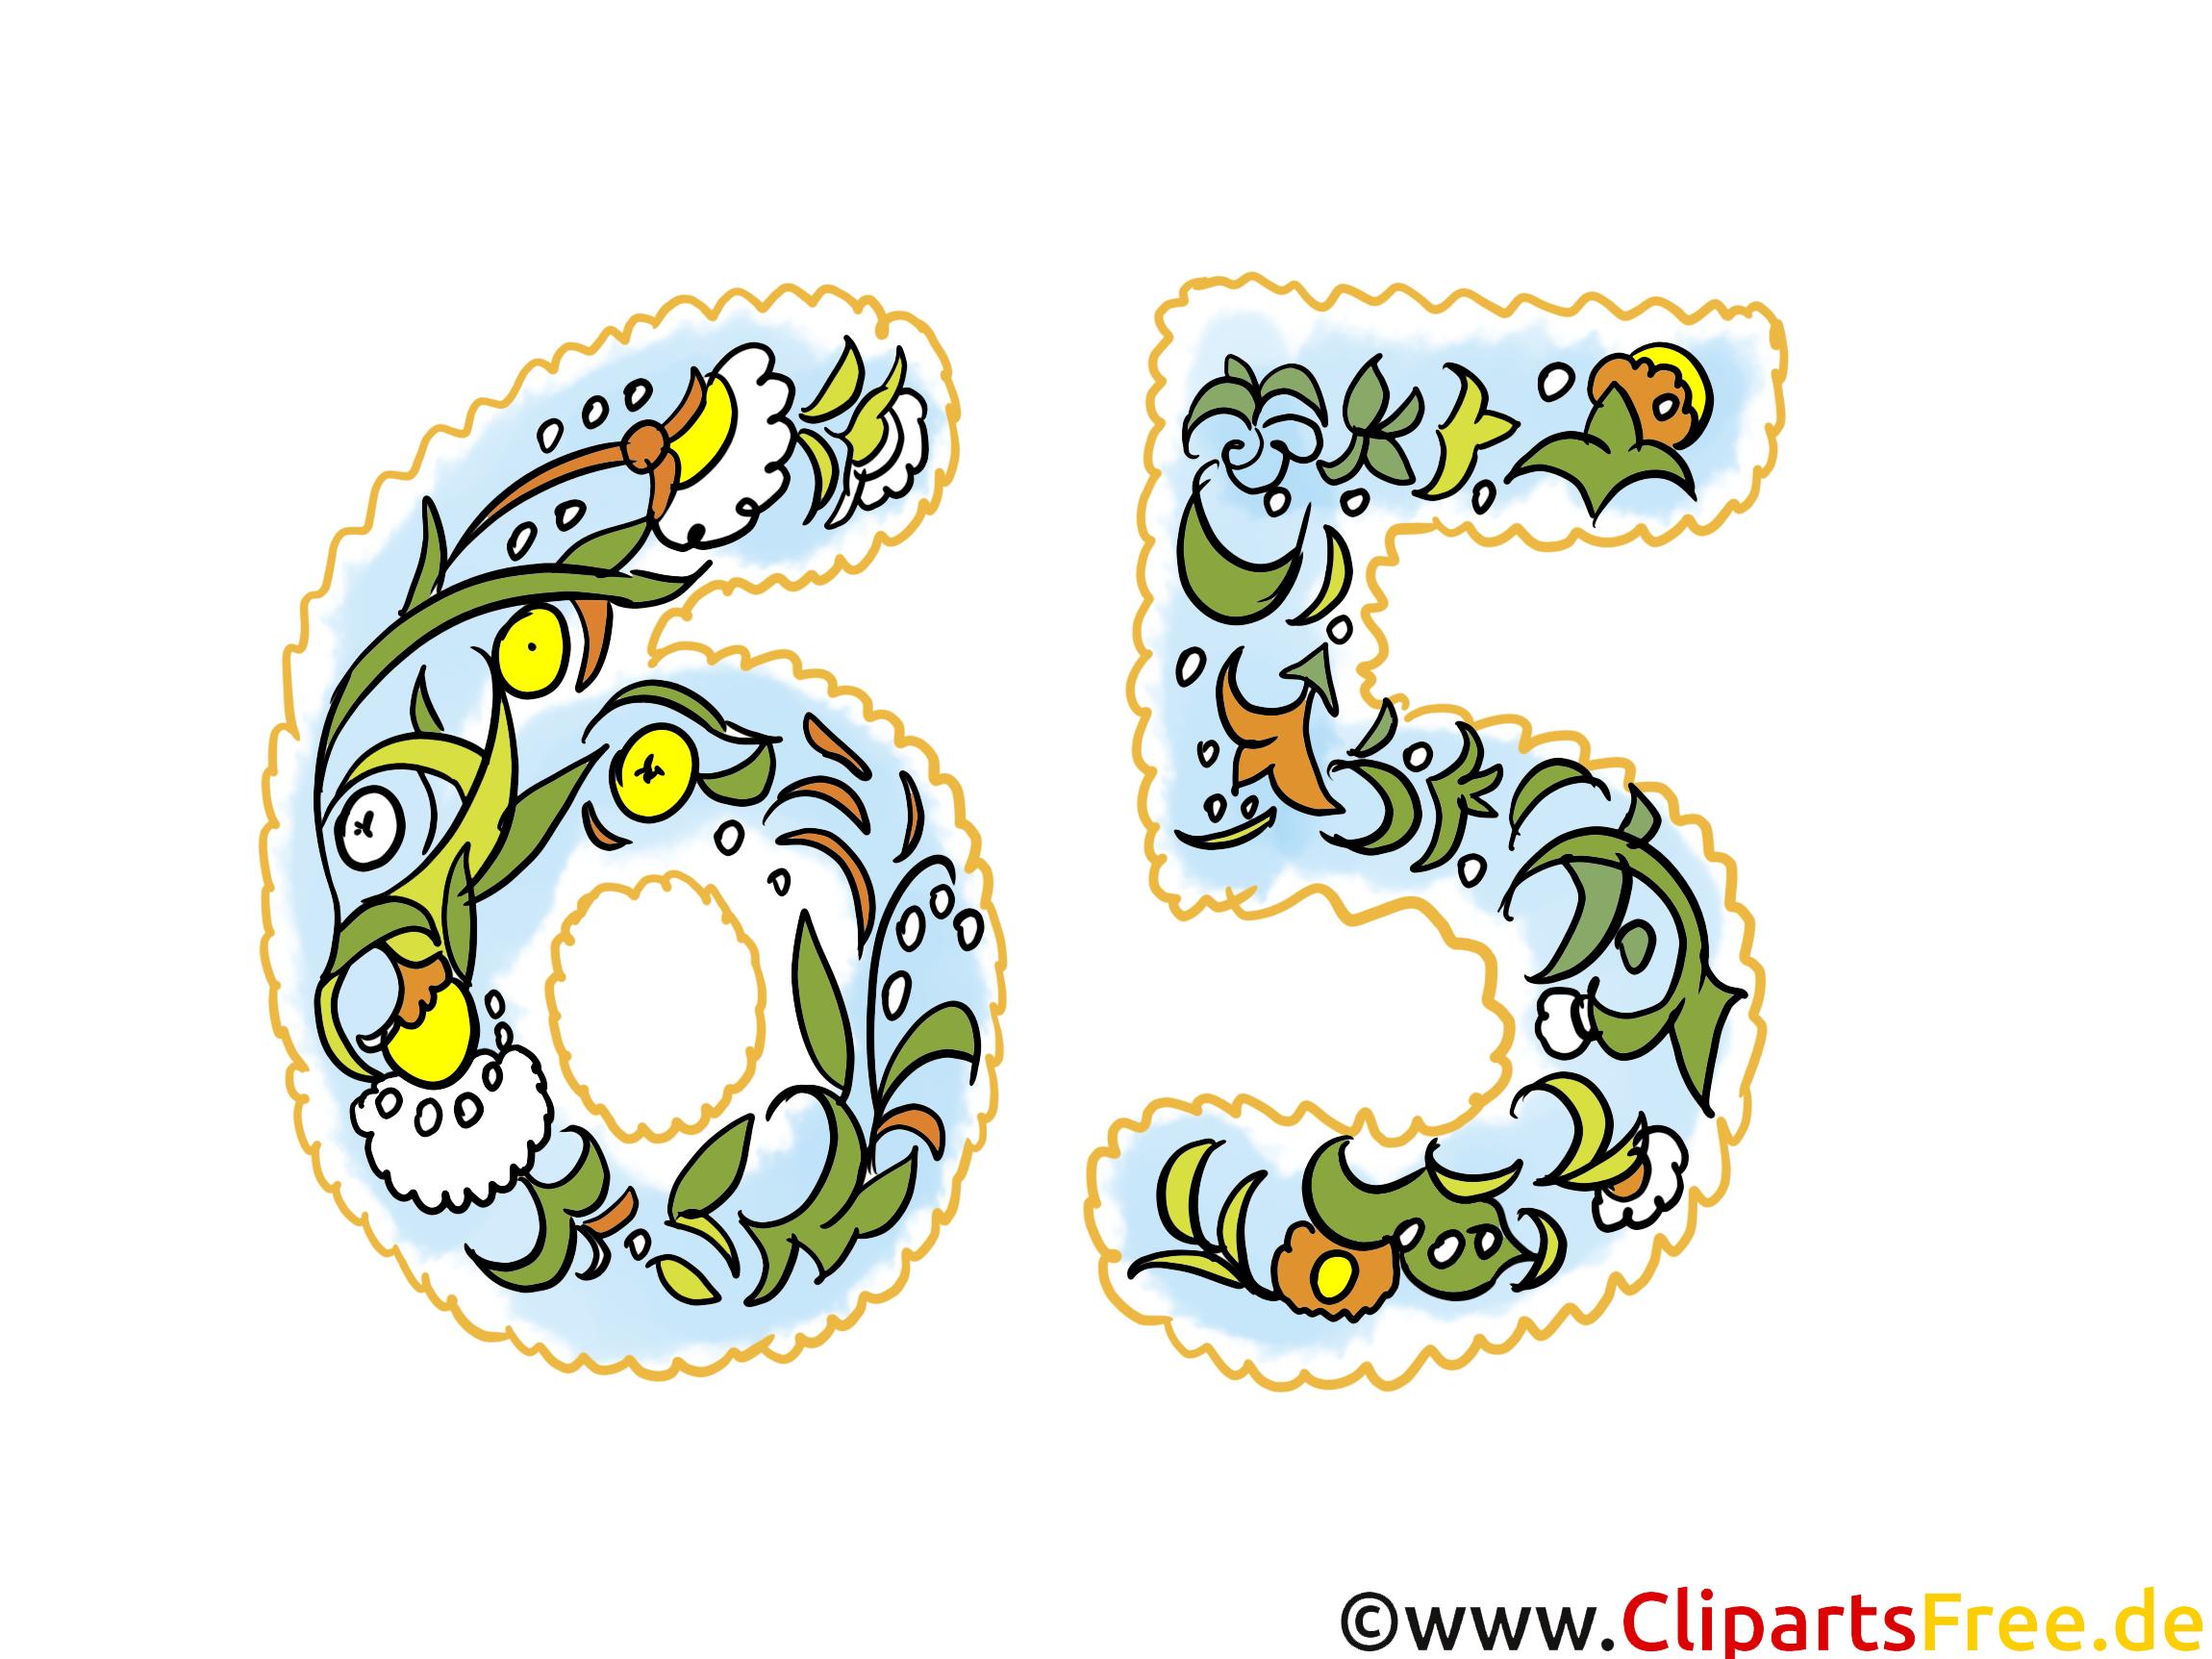 65 ans clip arts gratuits – Anniversaire illustrations